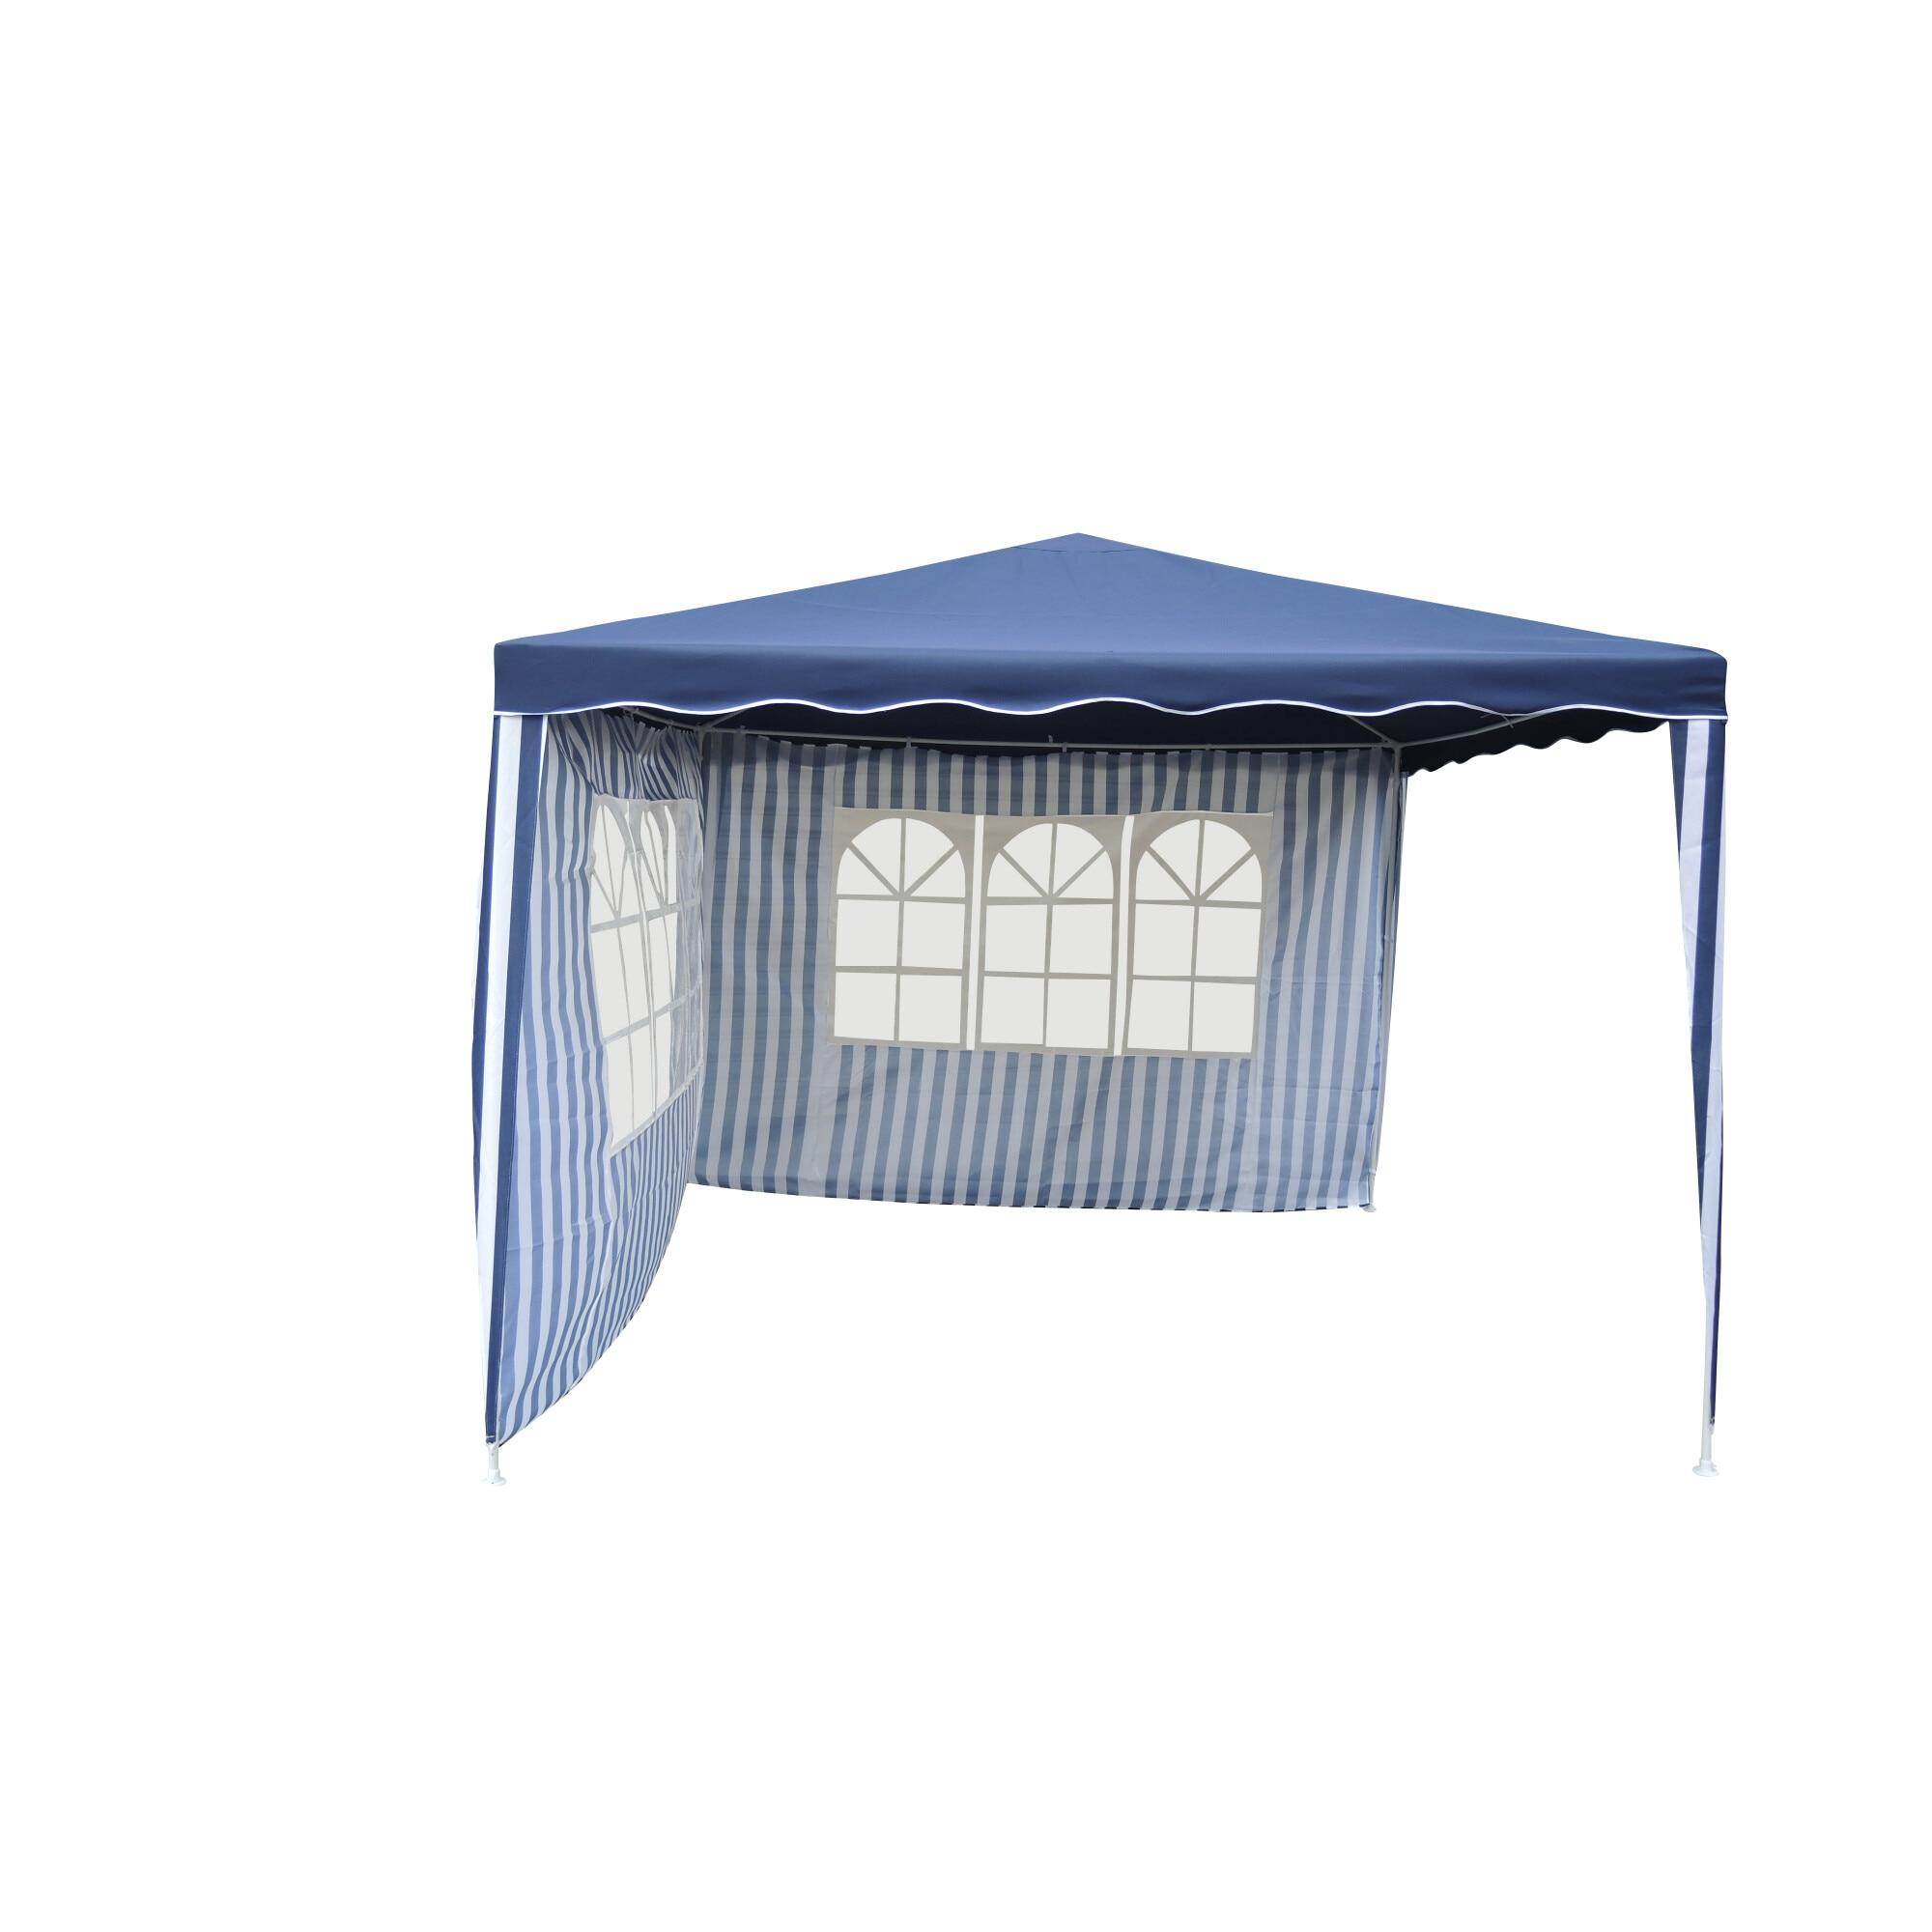 Fotografie Pavilion impermeabil Kring cu 2 pereti, 300x300 cm, Albastru